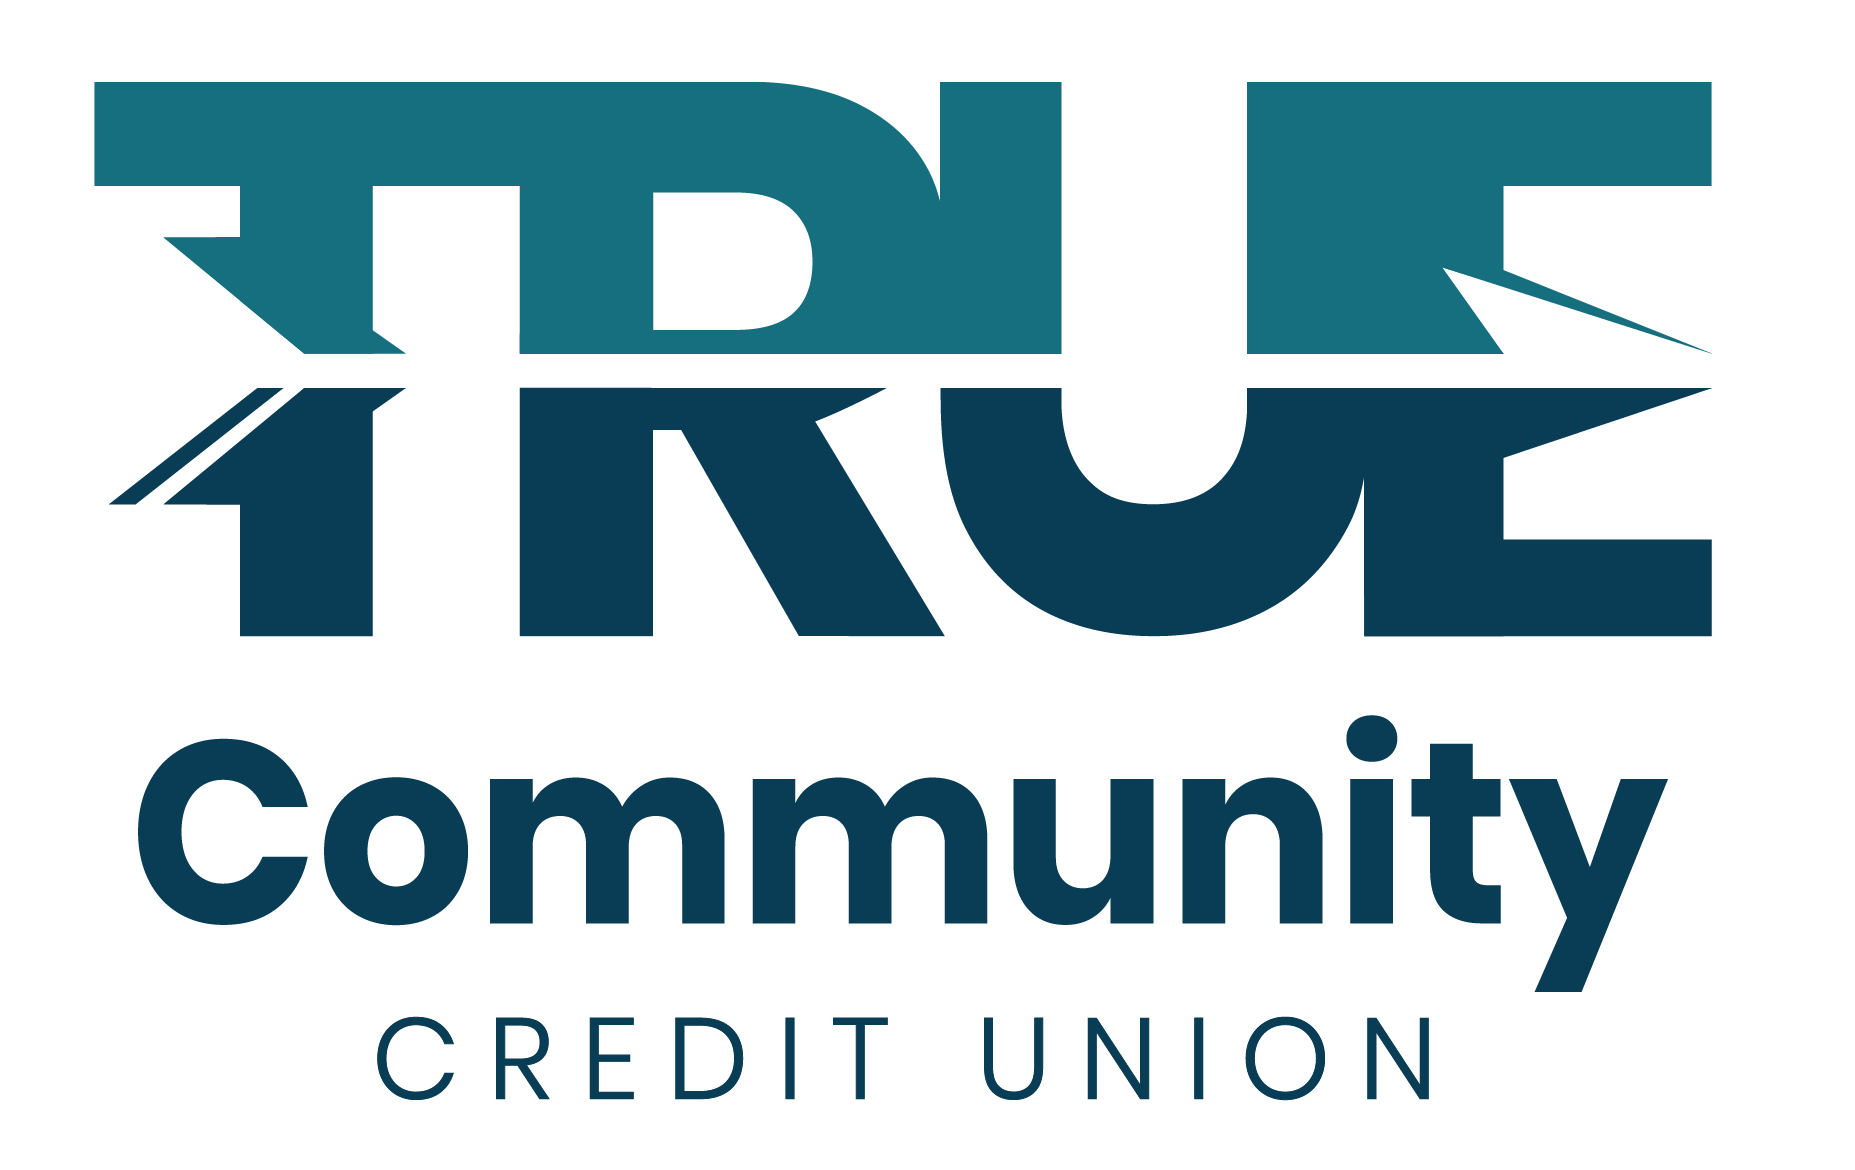 TRUE Community Credit Union logo